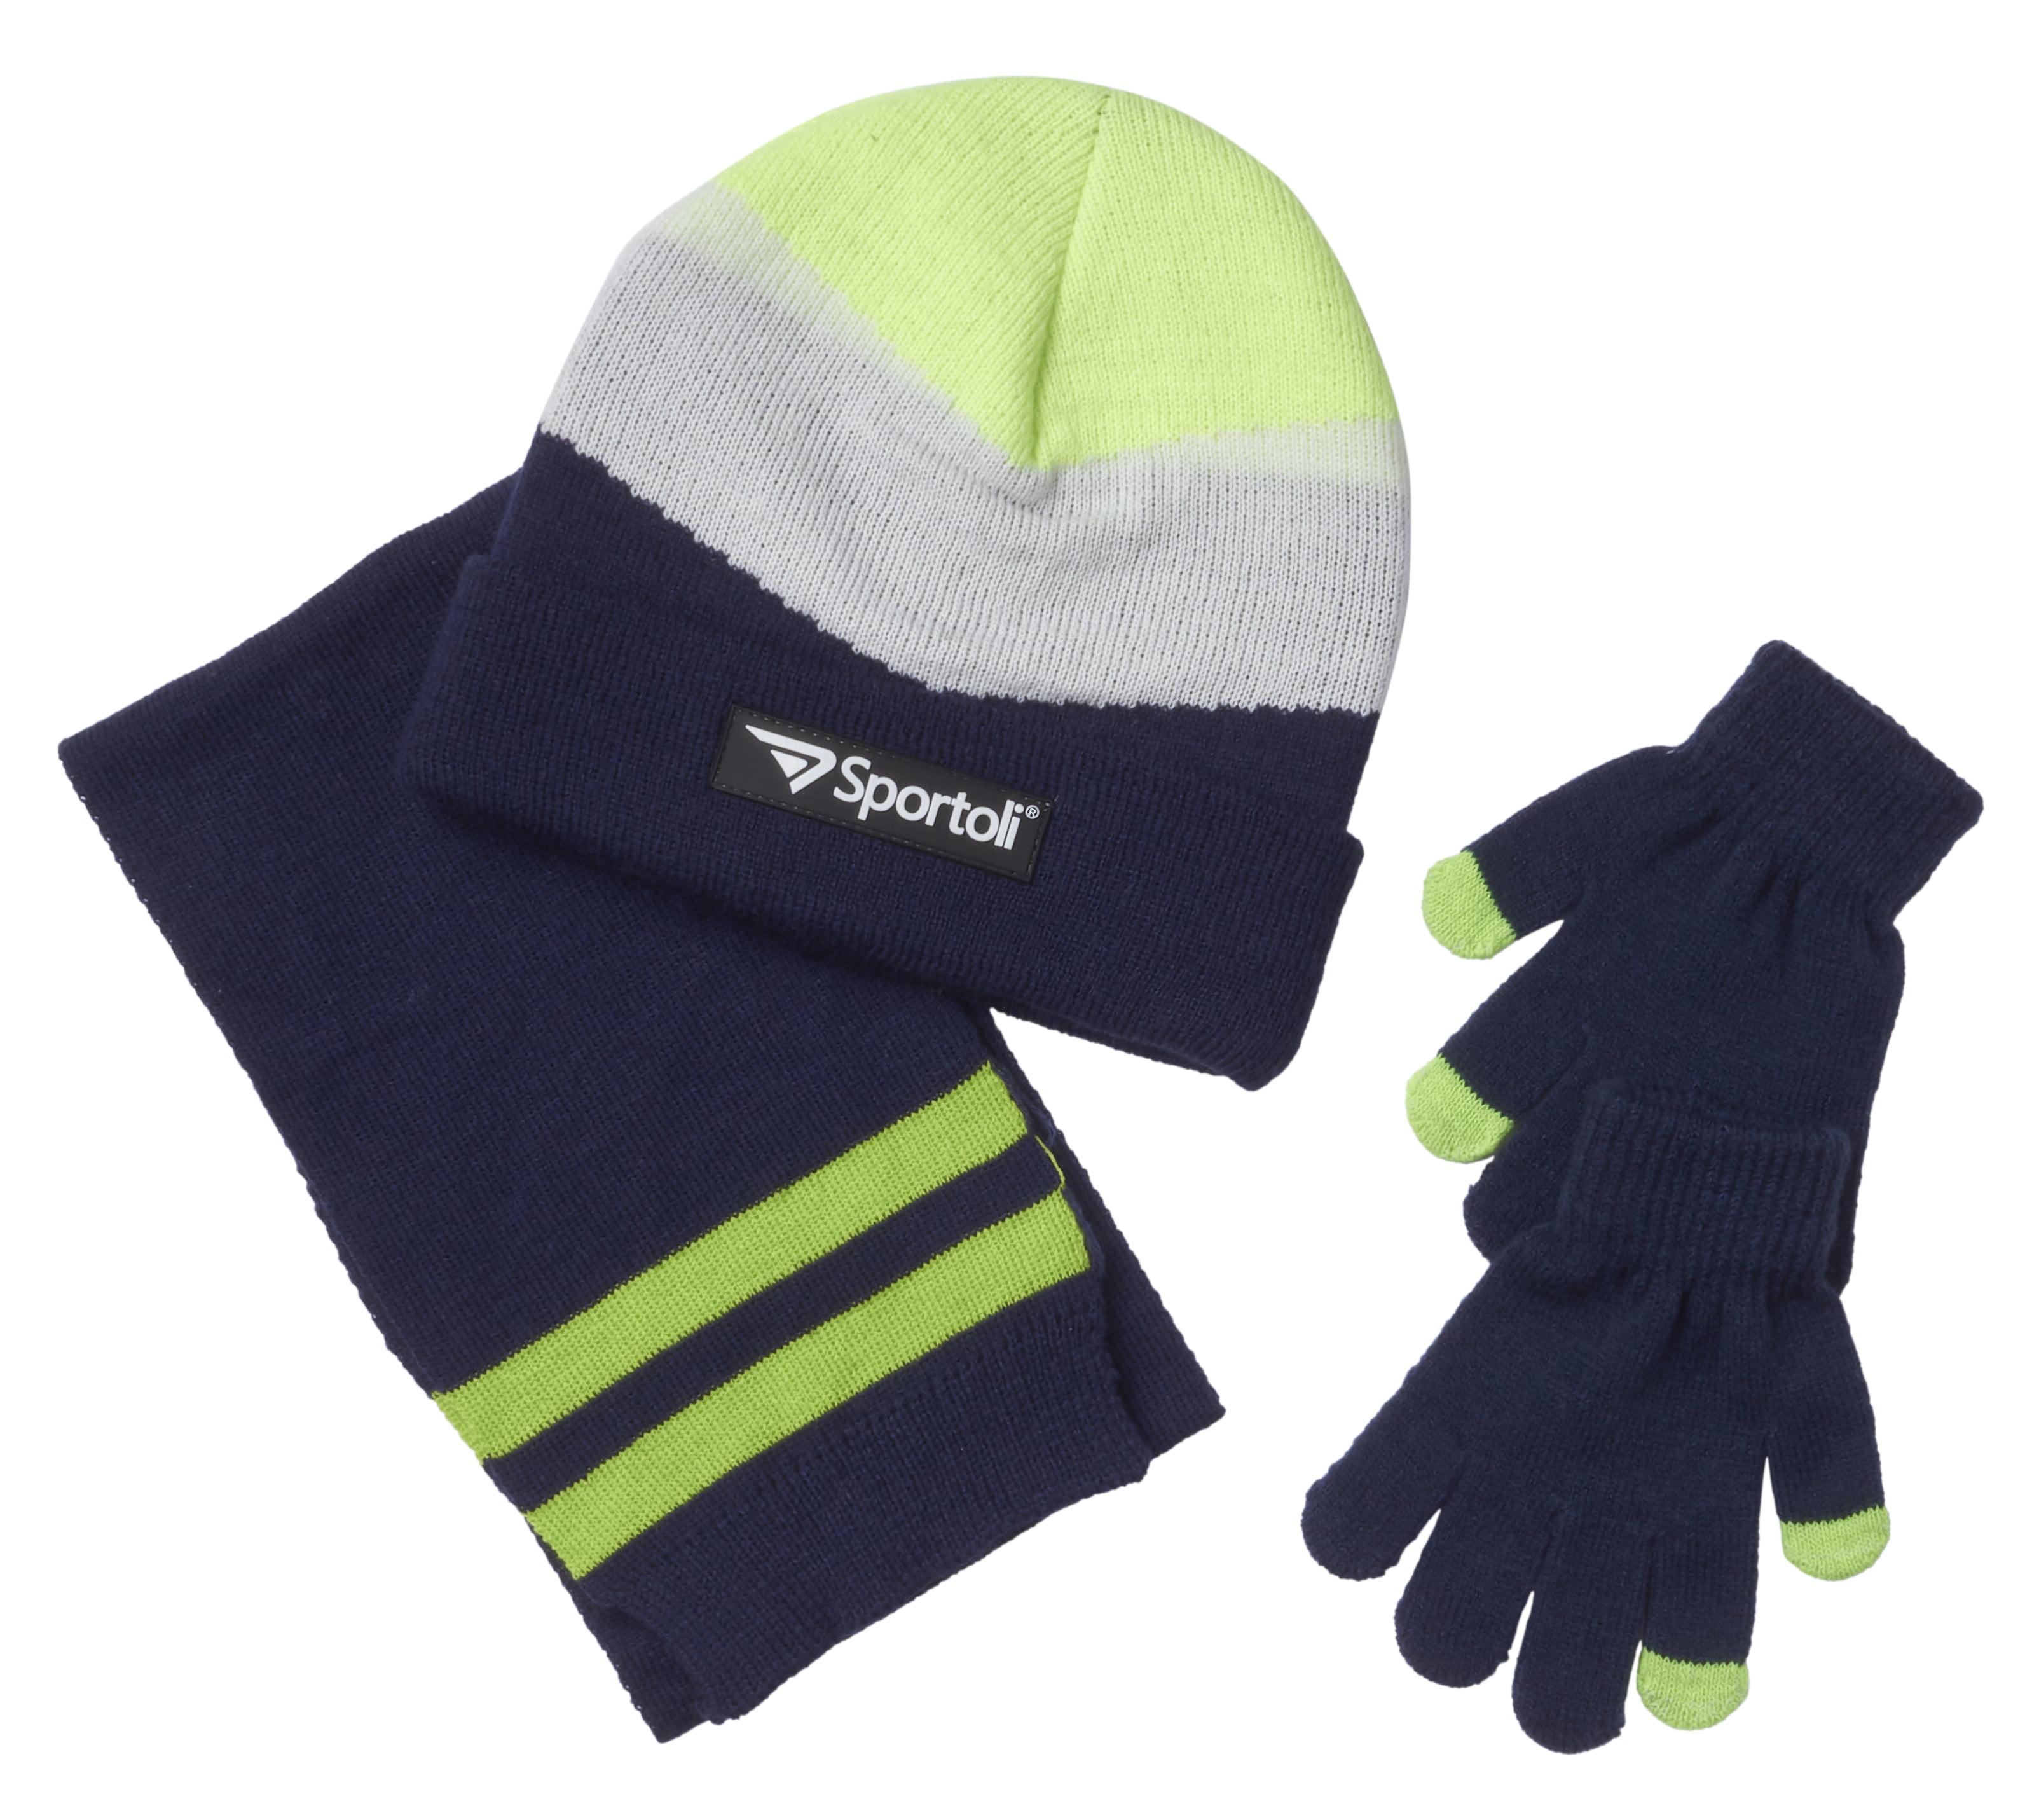 b2cb9eb563c2d8 Sportoli - Sportoli Men's and Boys' Kids 3-Piece Chevron Jersey Knit Cold  Weather Accessory Set Warm Lined Pull On Hat Scarf and Gloves - Walmart.com